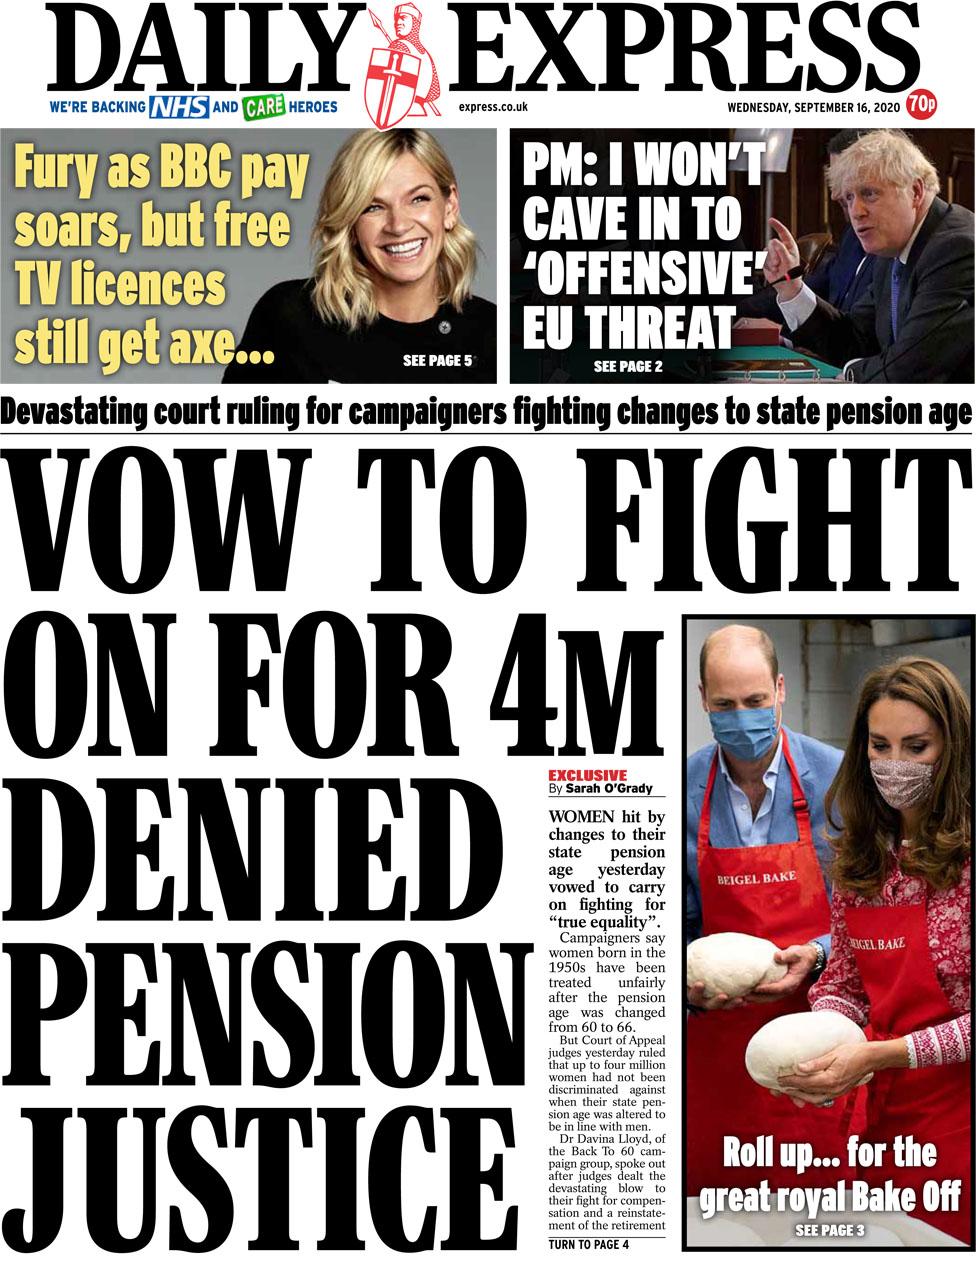 Daily Express 16 September